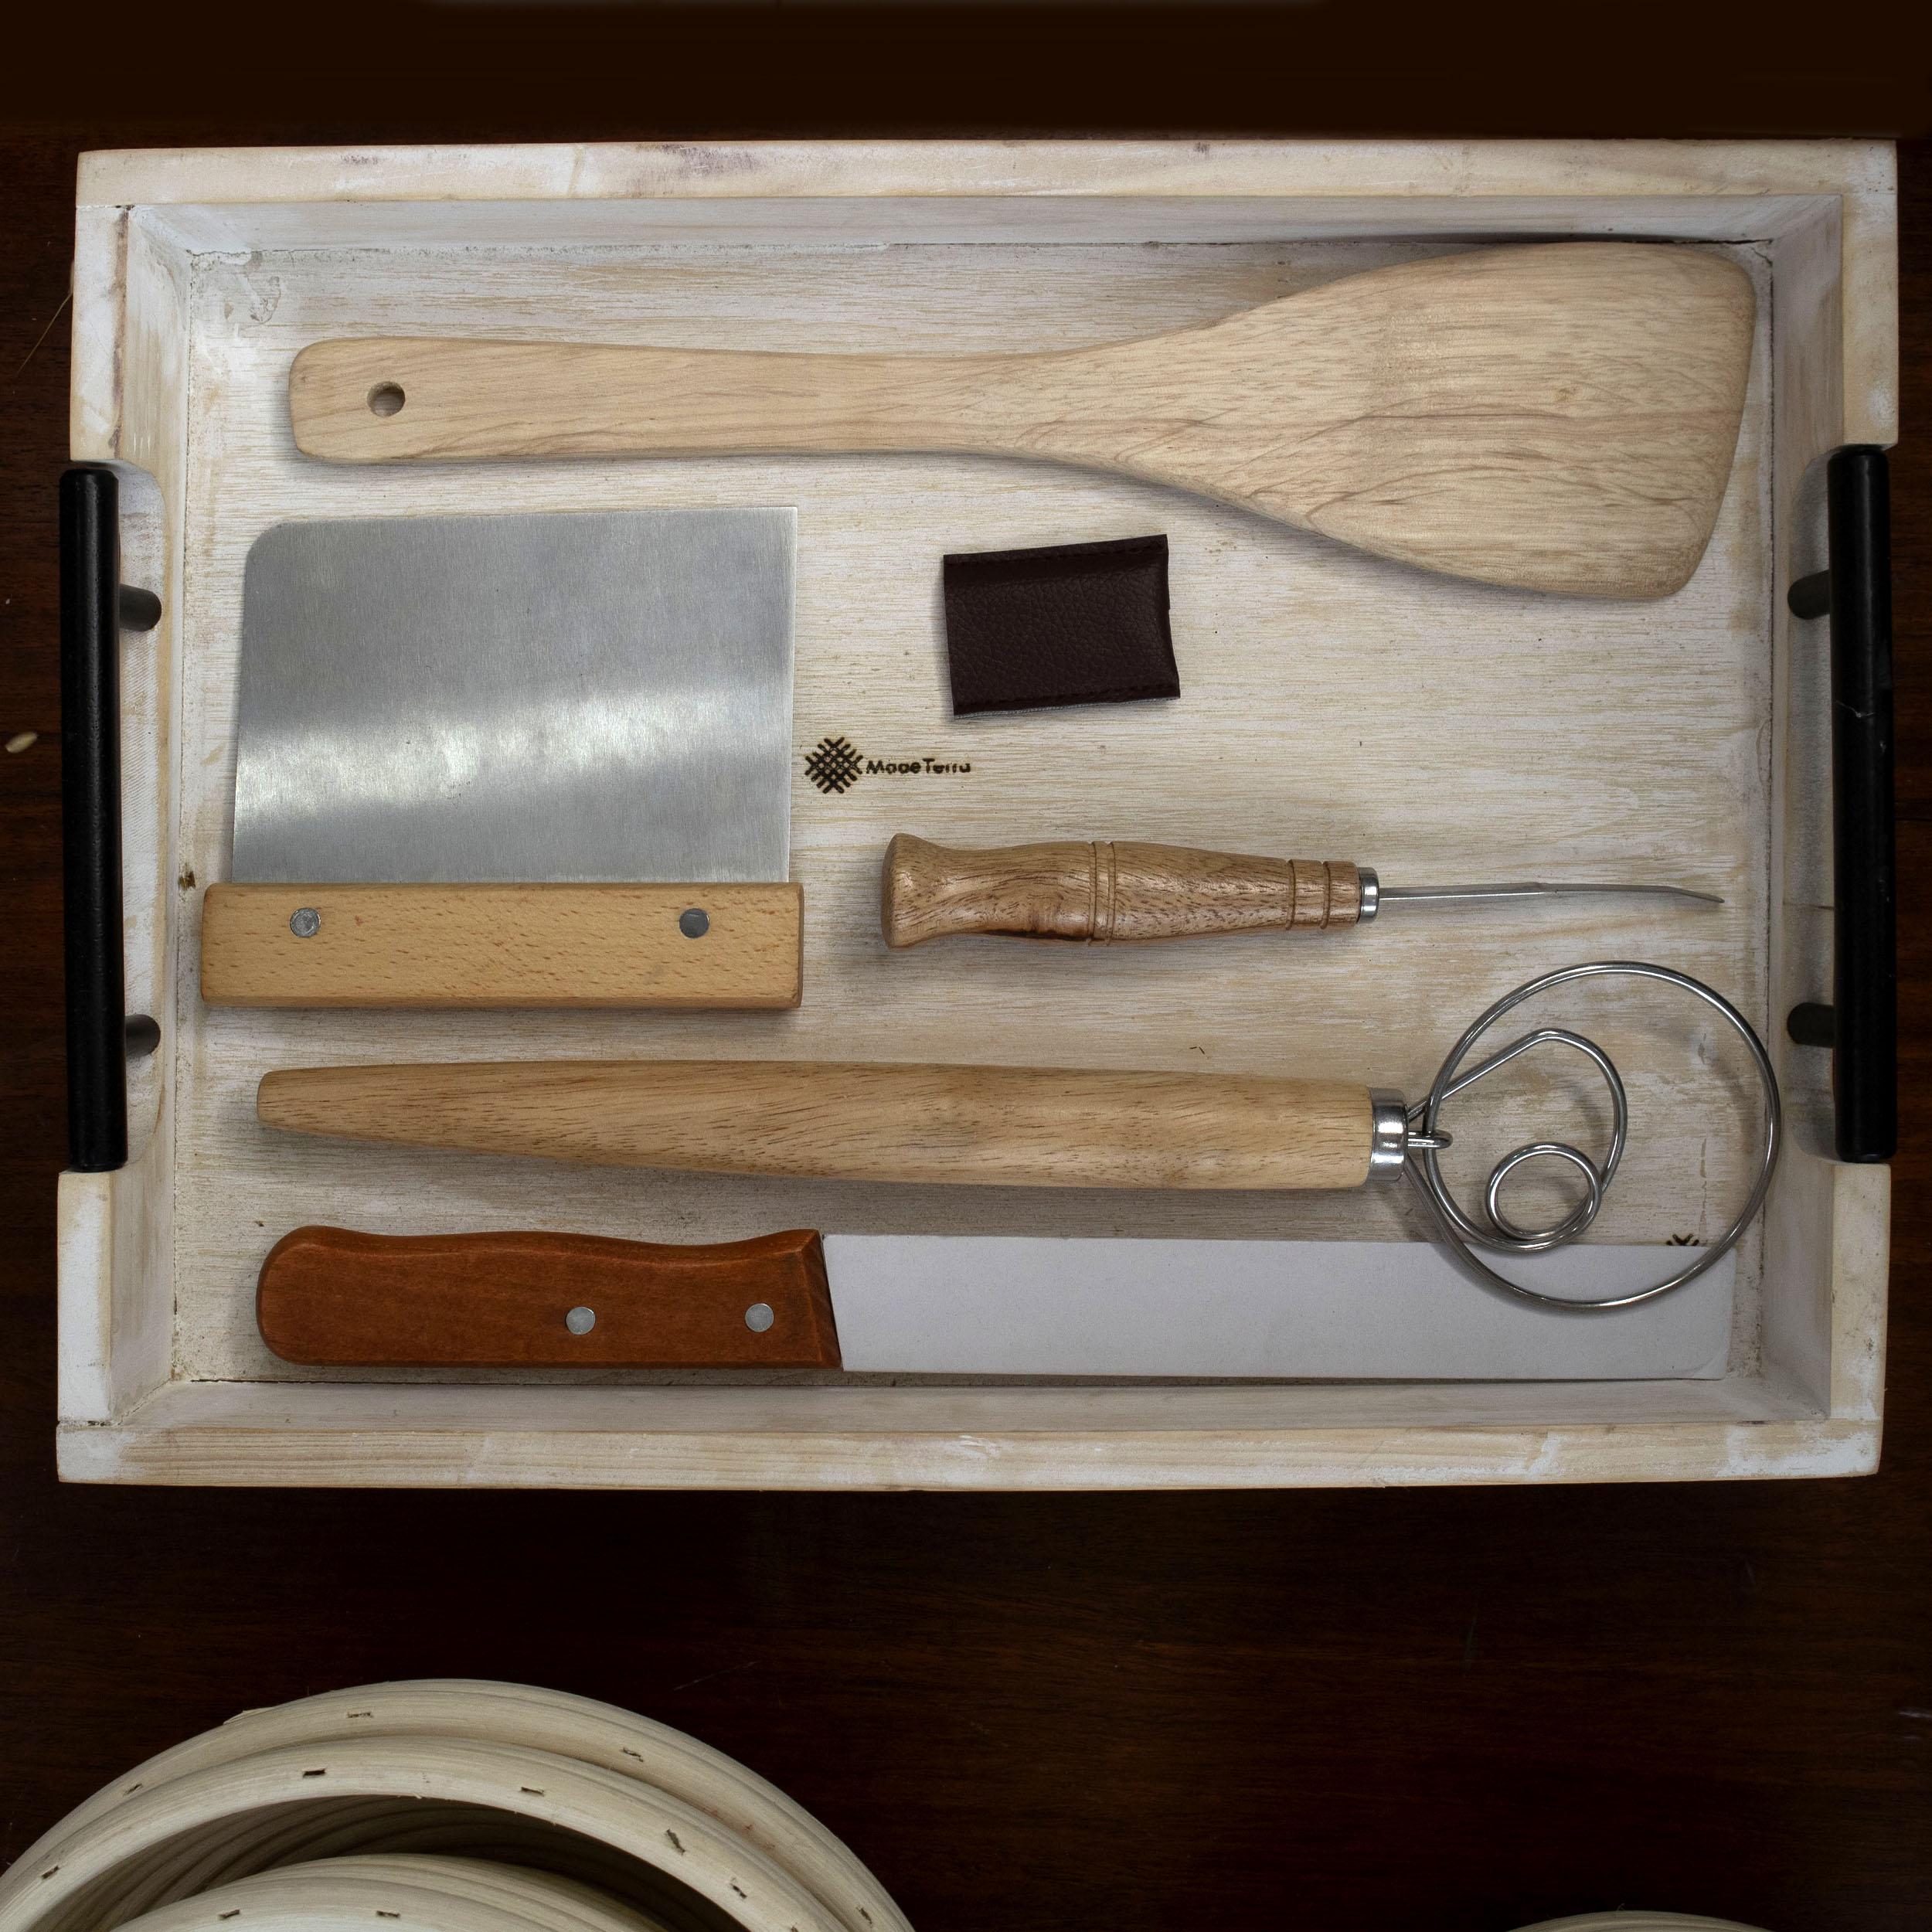 13 inch Danish Dough Whisk Mixer Blender & Hand Mixer Kitchenware Tool Cake Dessert Bread Baking Pizza Pastry Food Mixer or Hook